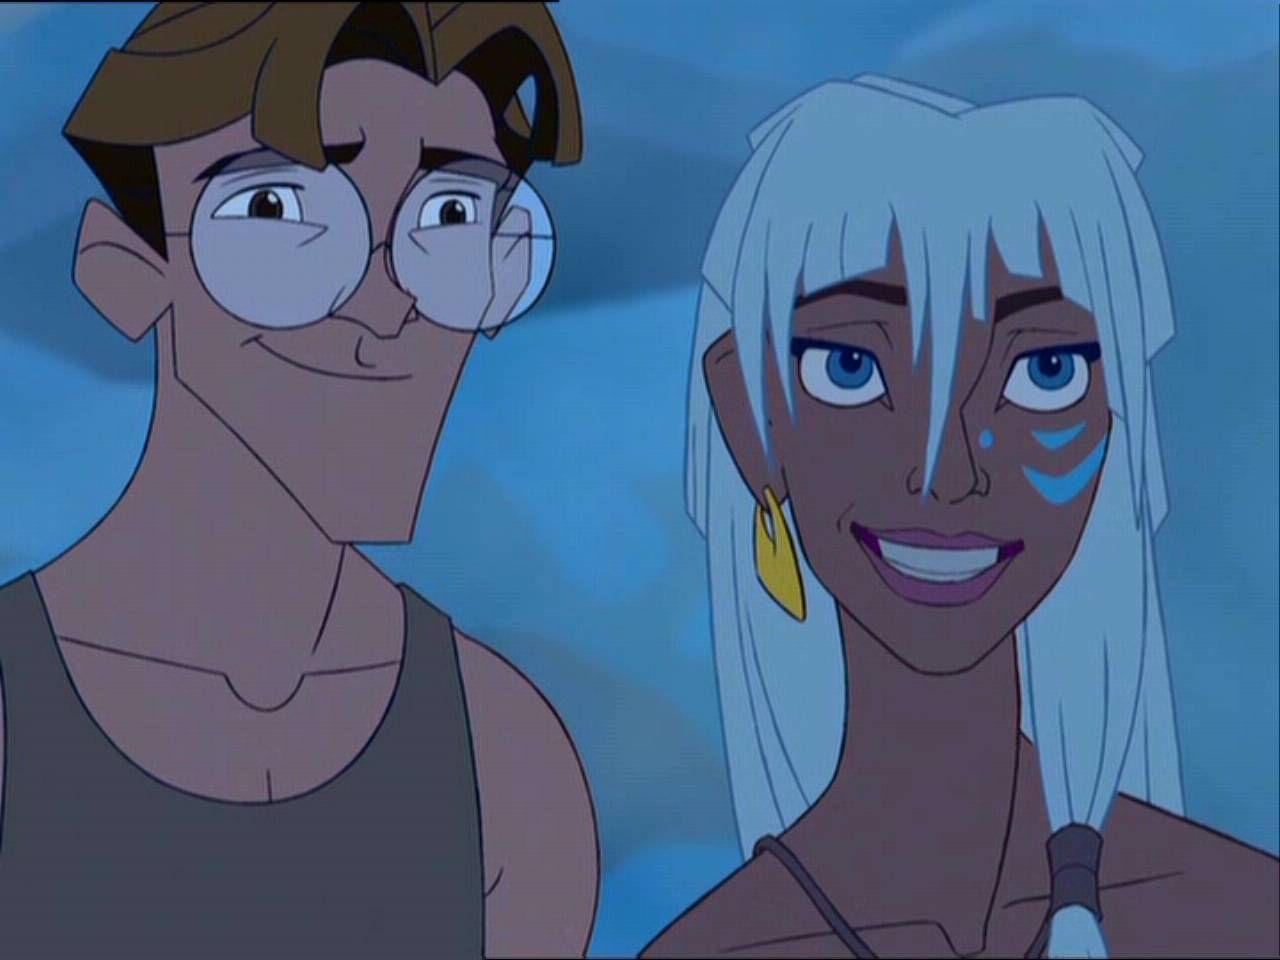 22 Reasons Atlantis Is The Most Underrated Disney Movie Atlantis The Lost Empire Disney Films Atlantis